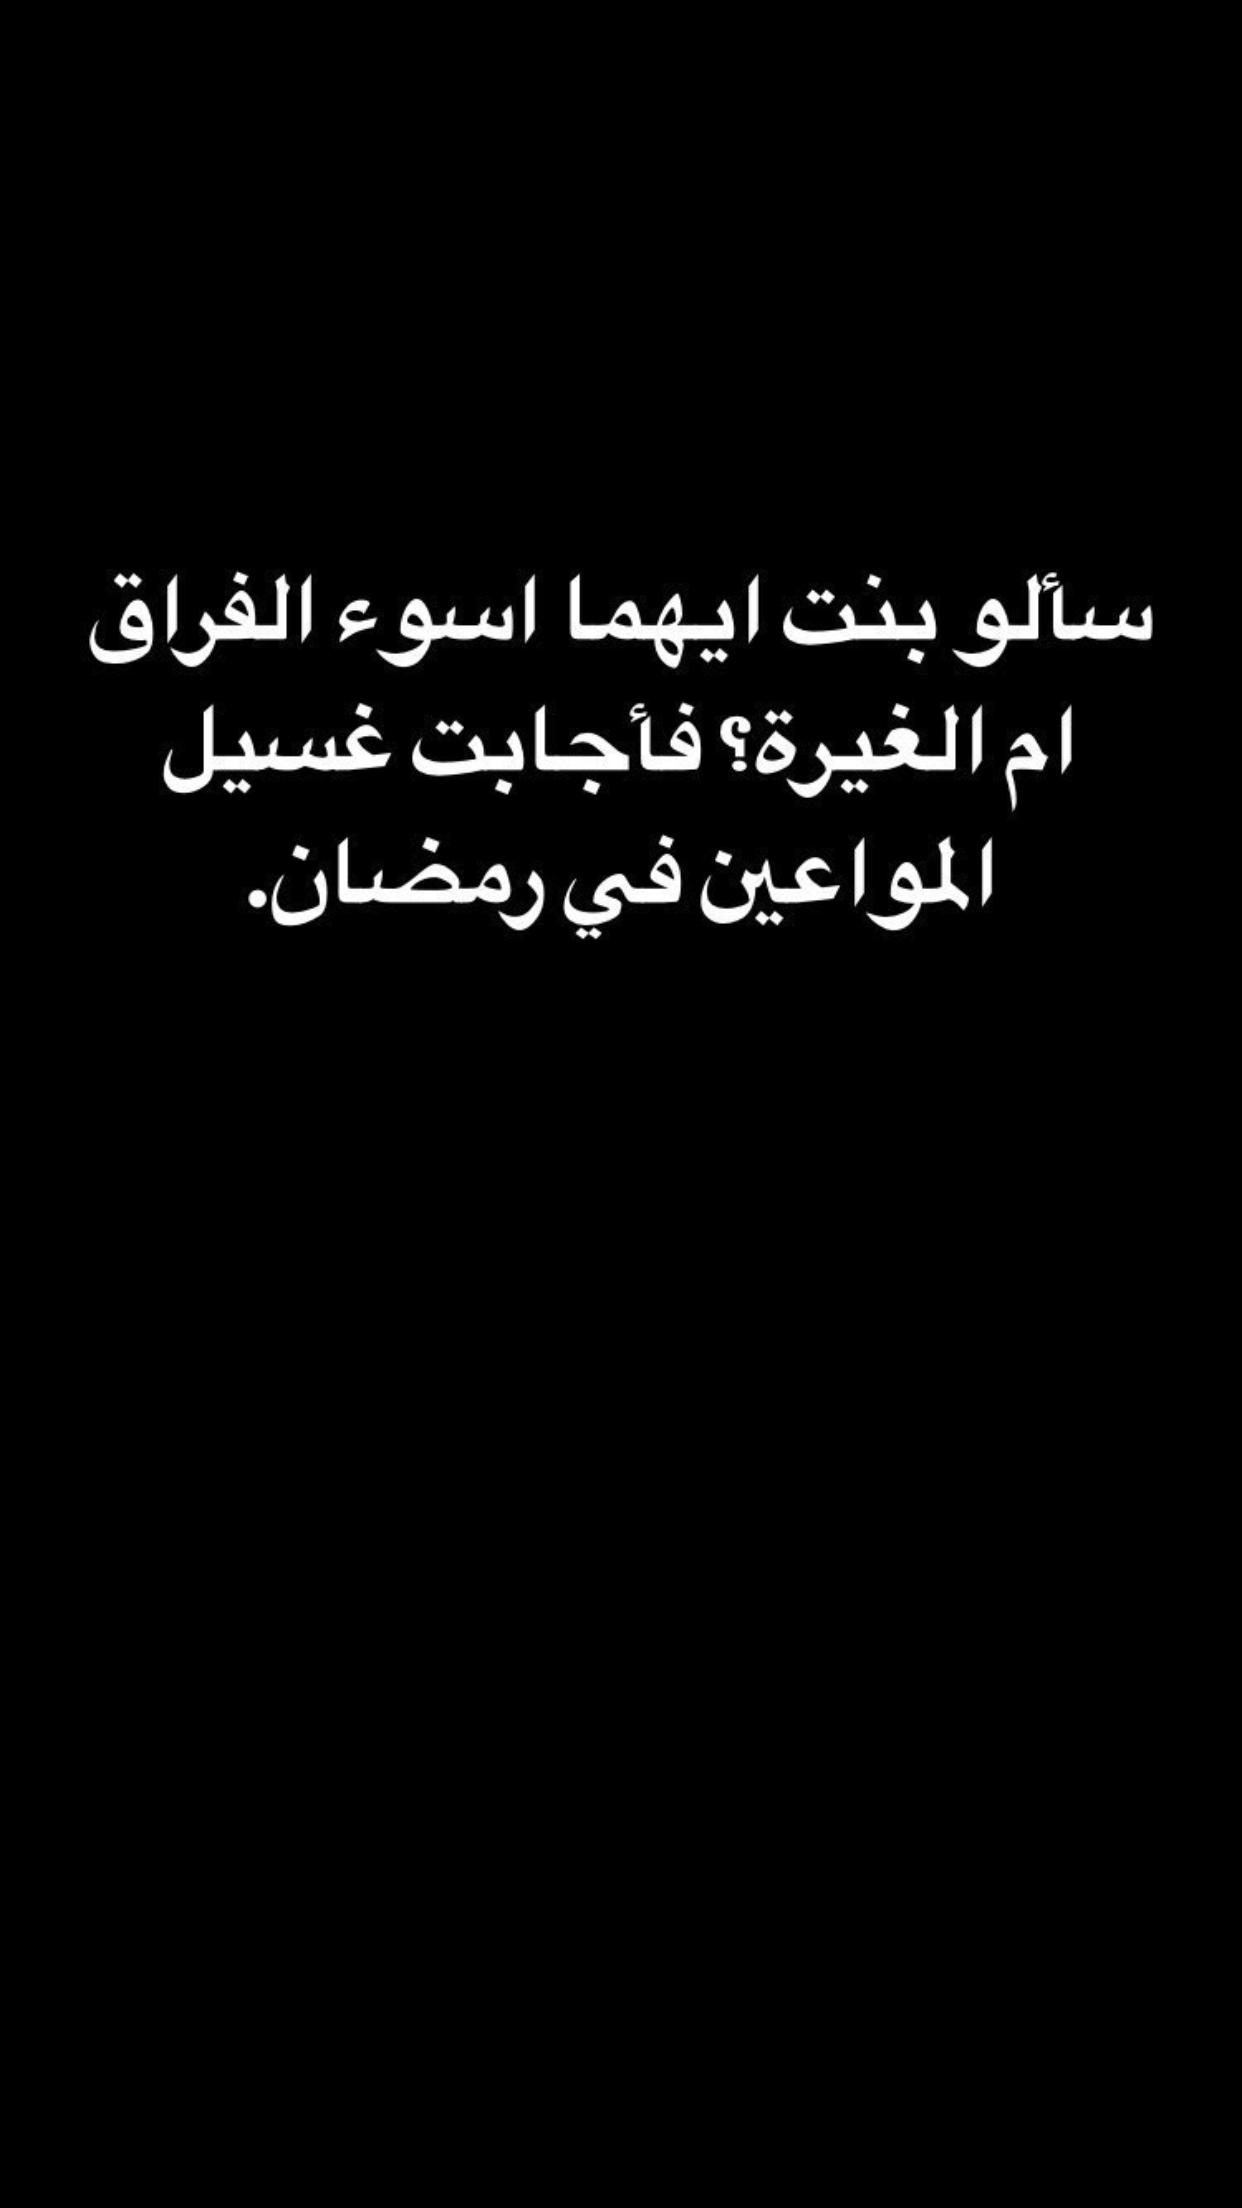 Pin By Edo On فعاليات ميمز Funny Arabic Quotes Garden Show Arabic Love Quotes